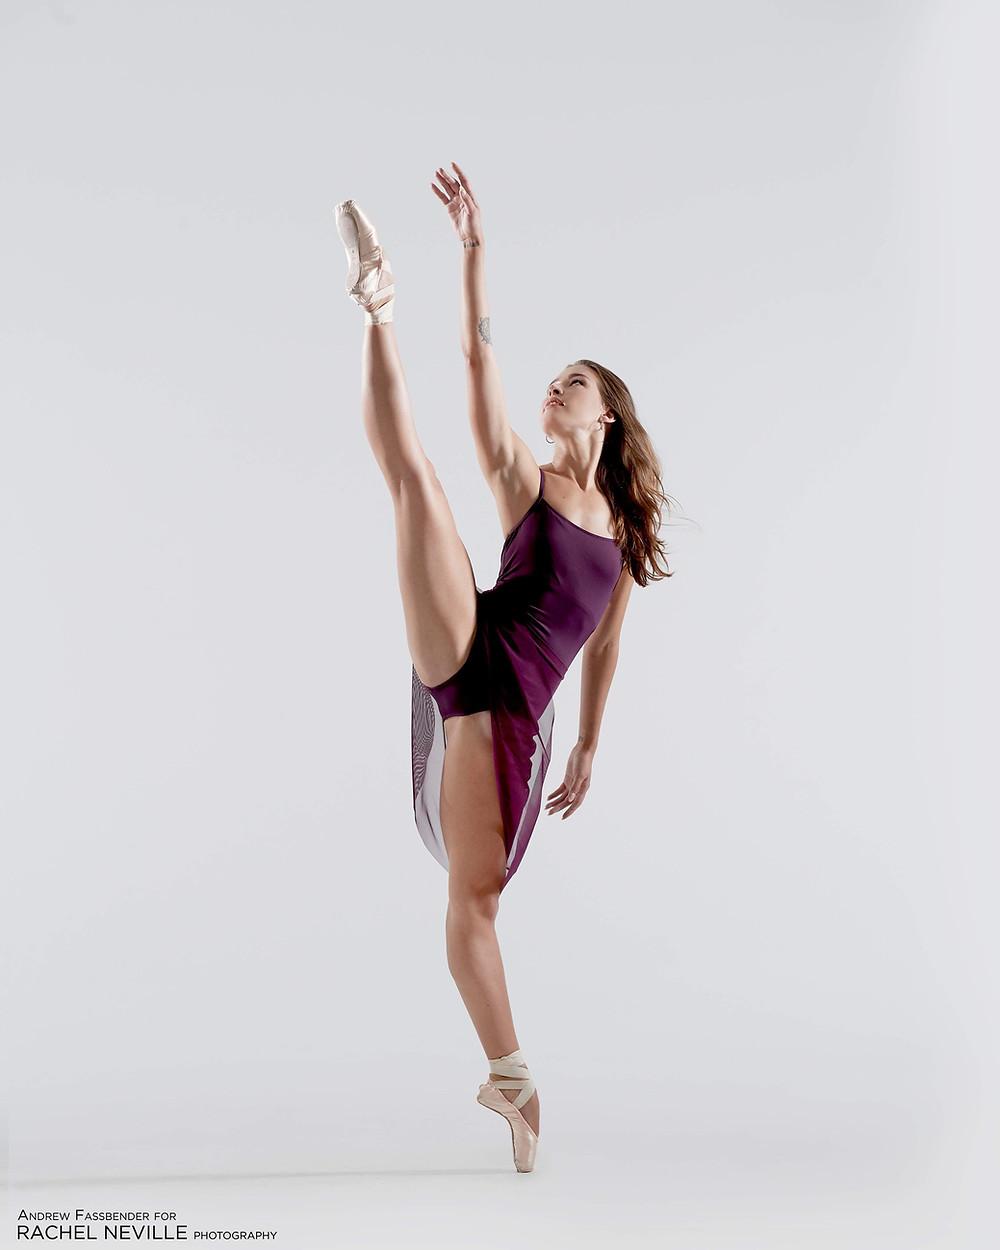 Ballet West soloist Chelsea Keefer